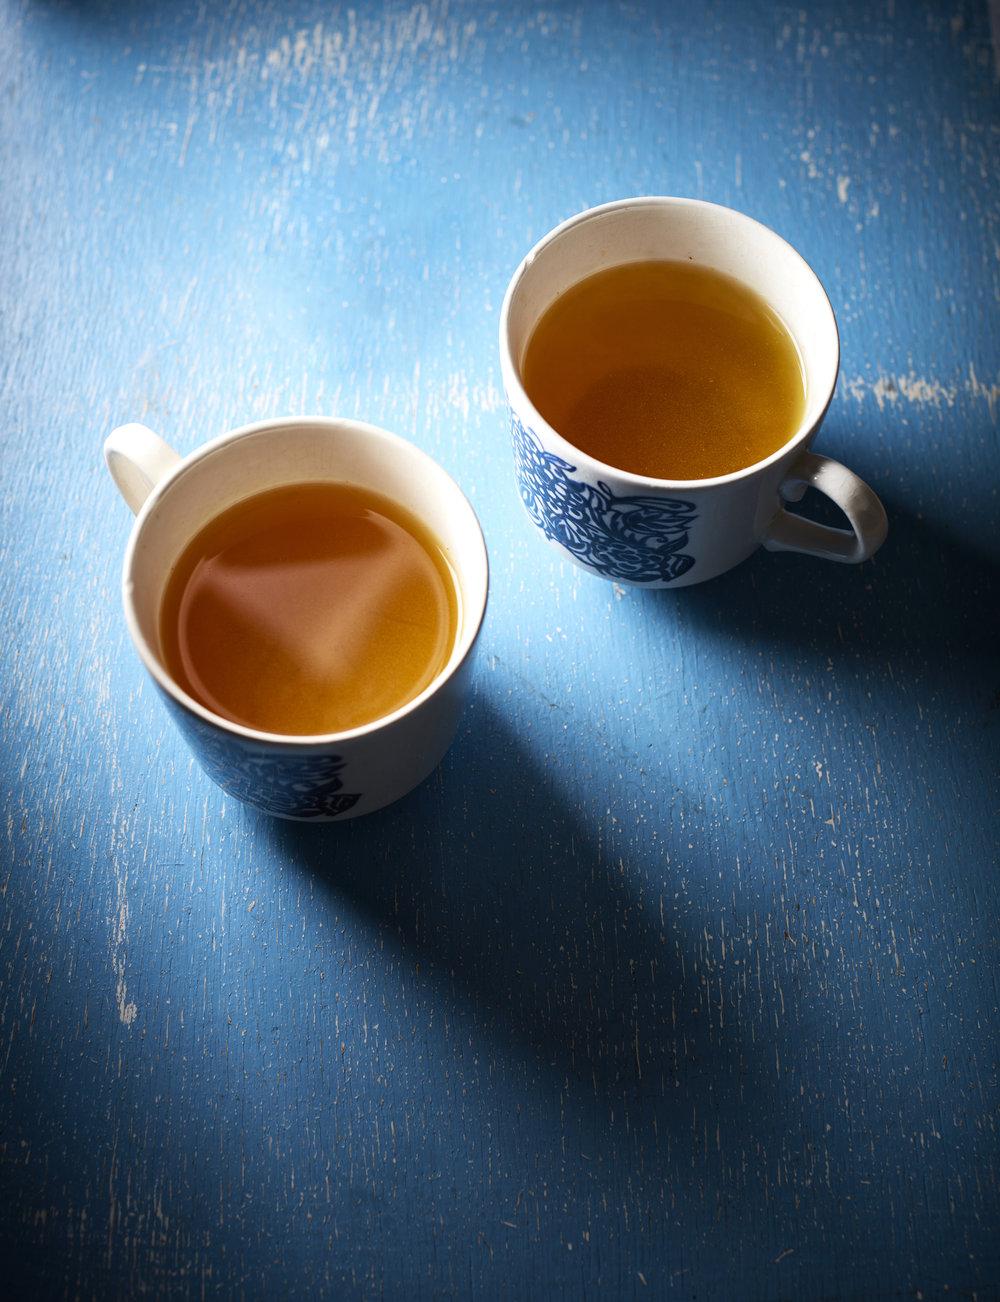 CGDRB_Turmeric Tea_040_Joe Sarah.jpg